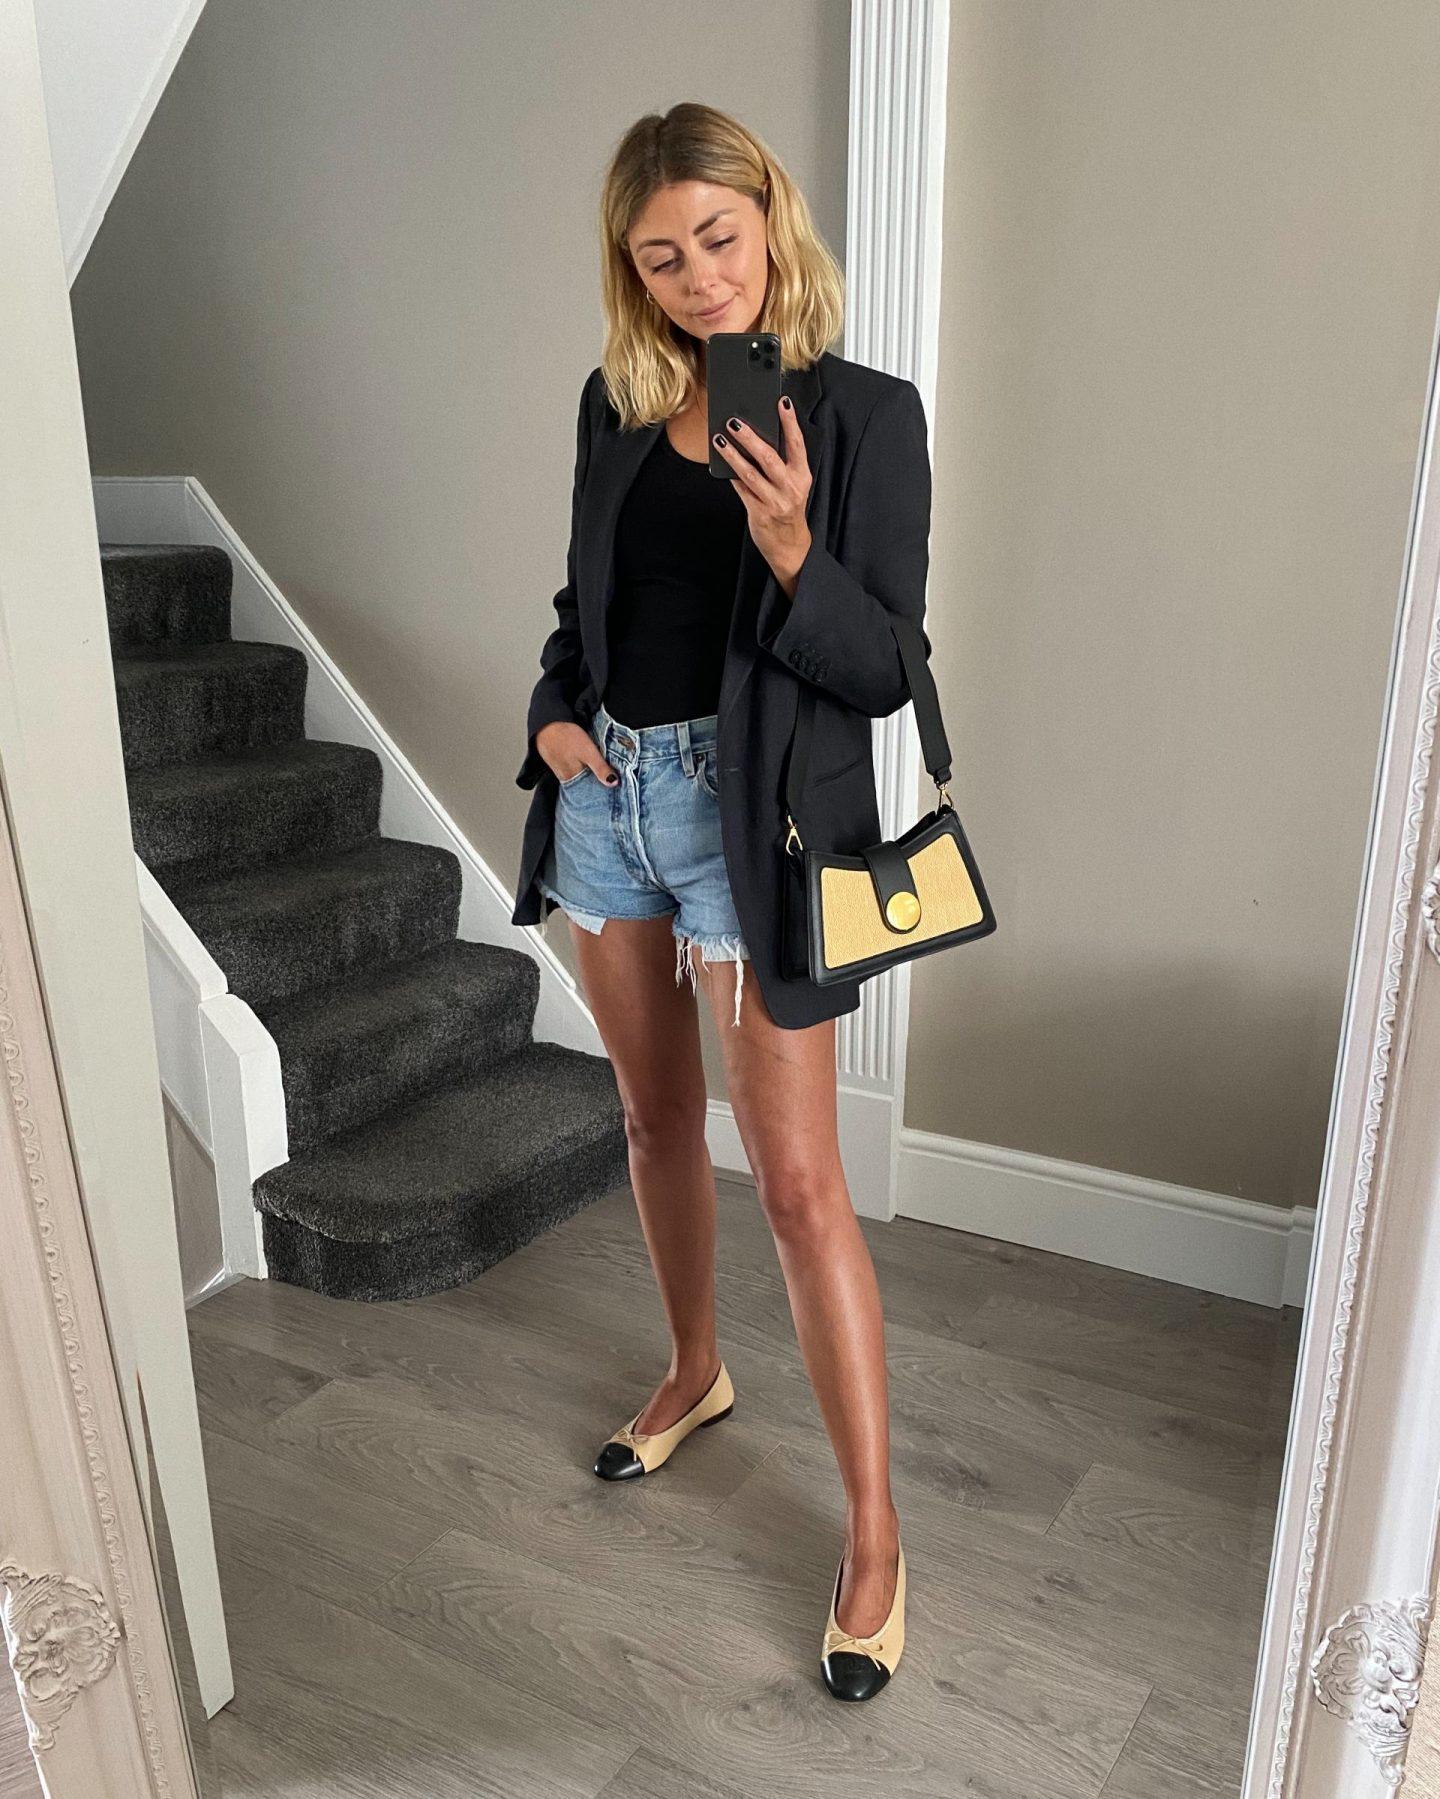 Emma Hill style. Navy linen blazer, Chanel ballet pumps flats, vintage Levi's 501 cut offs denim shorts. Summer outfit